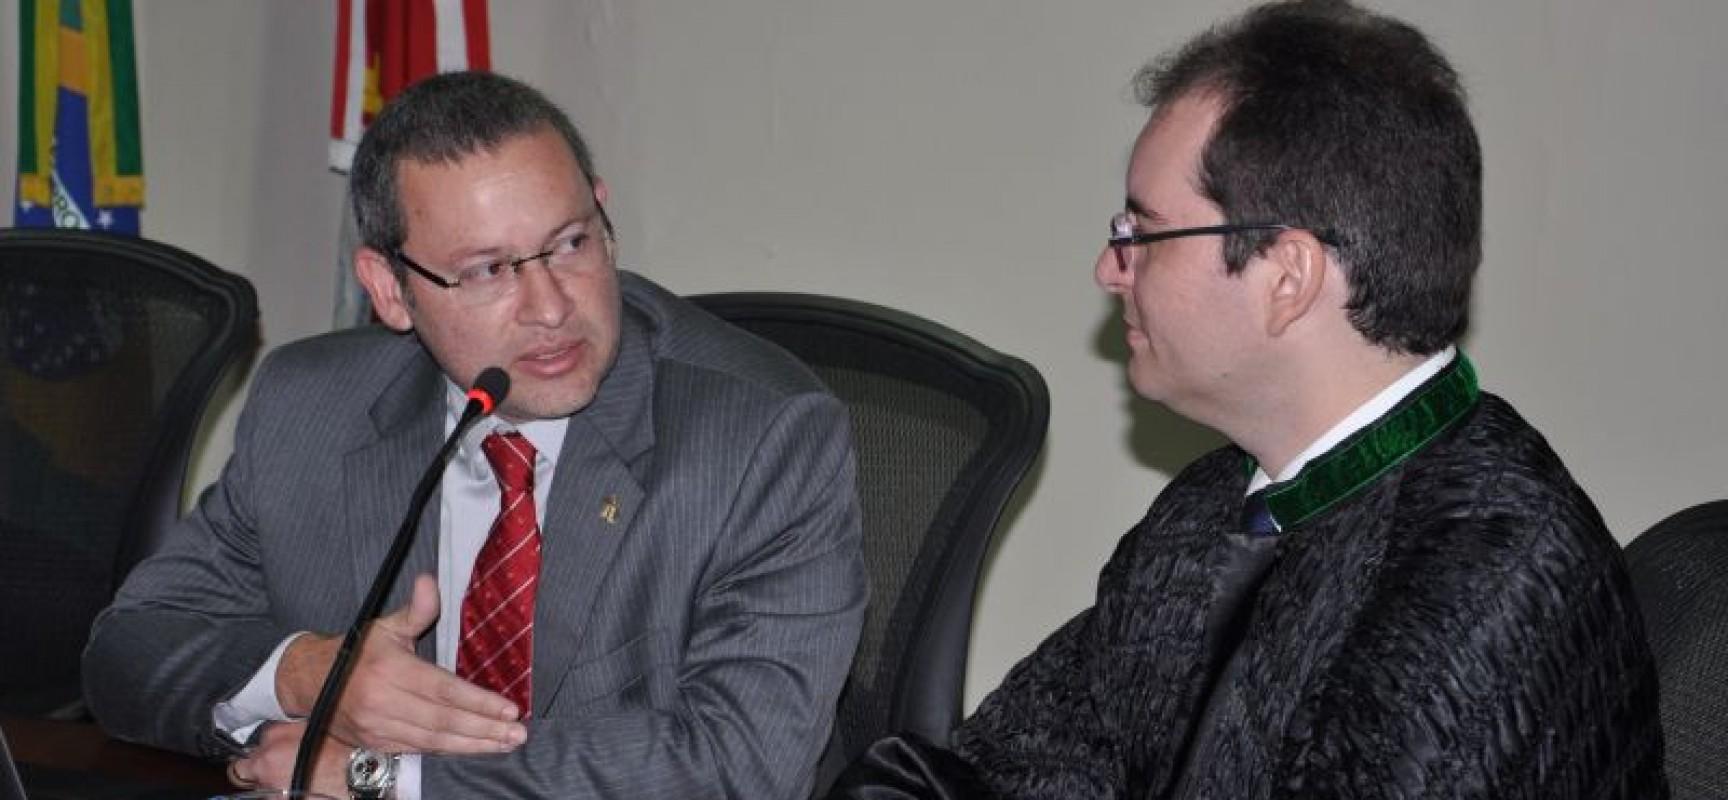 CPJ empossa novo promotor de justiça